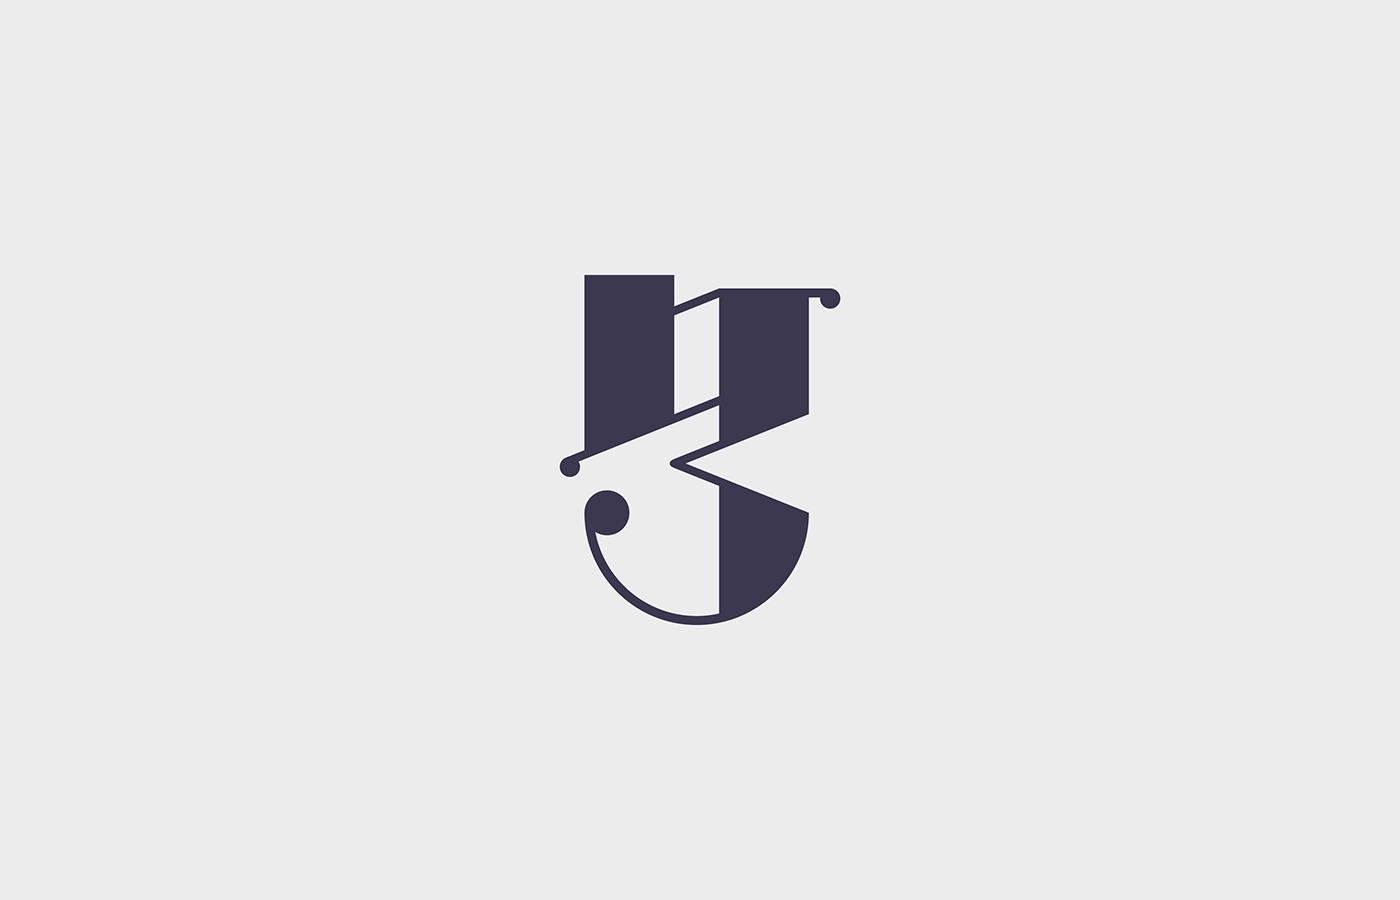 36daysoftype type letterring numbers logo design brand mark Kuwait KSA amman typographic typelogo letters